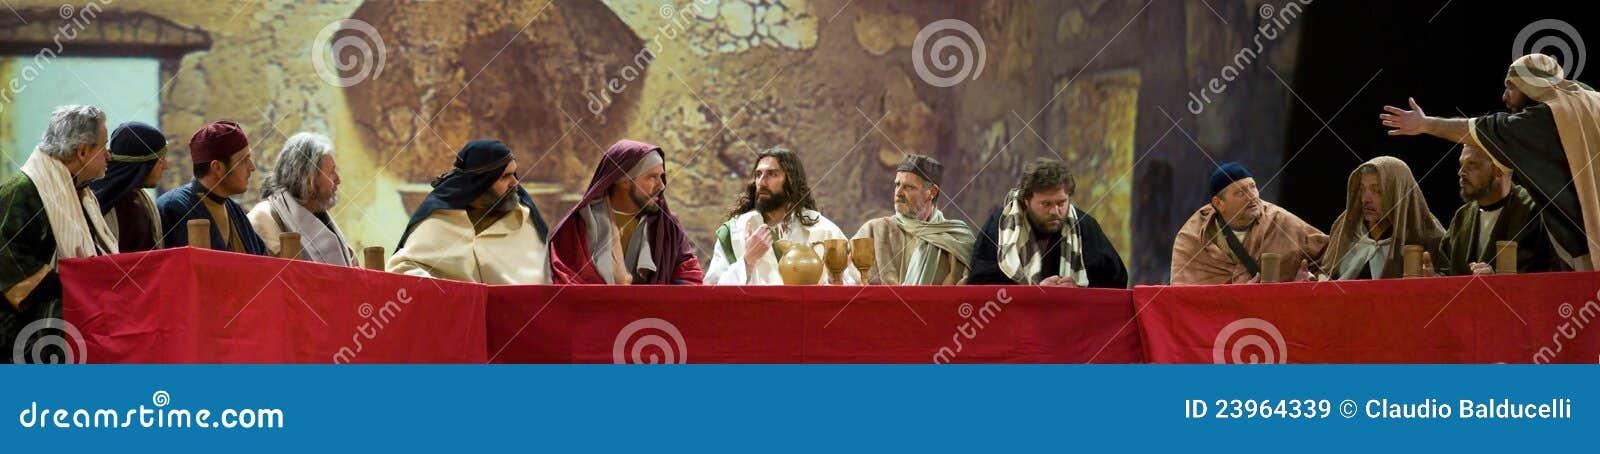 Ultima cena di Jesus